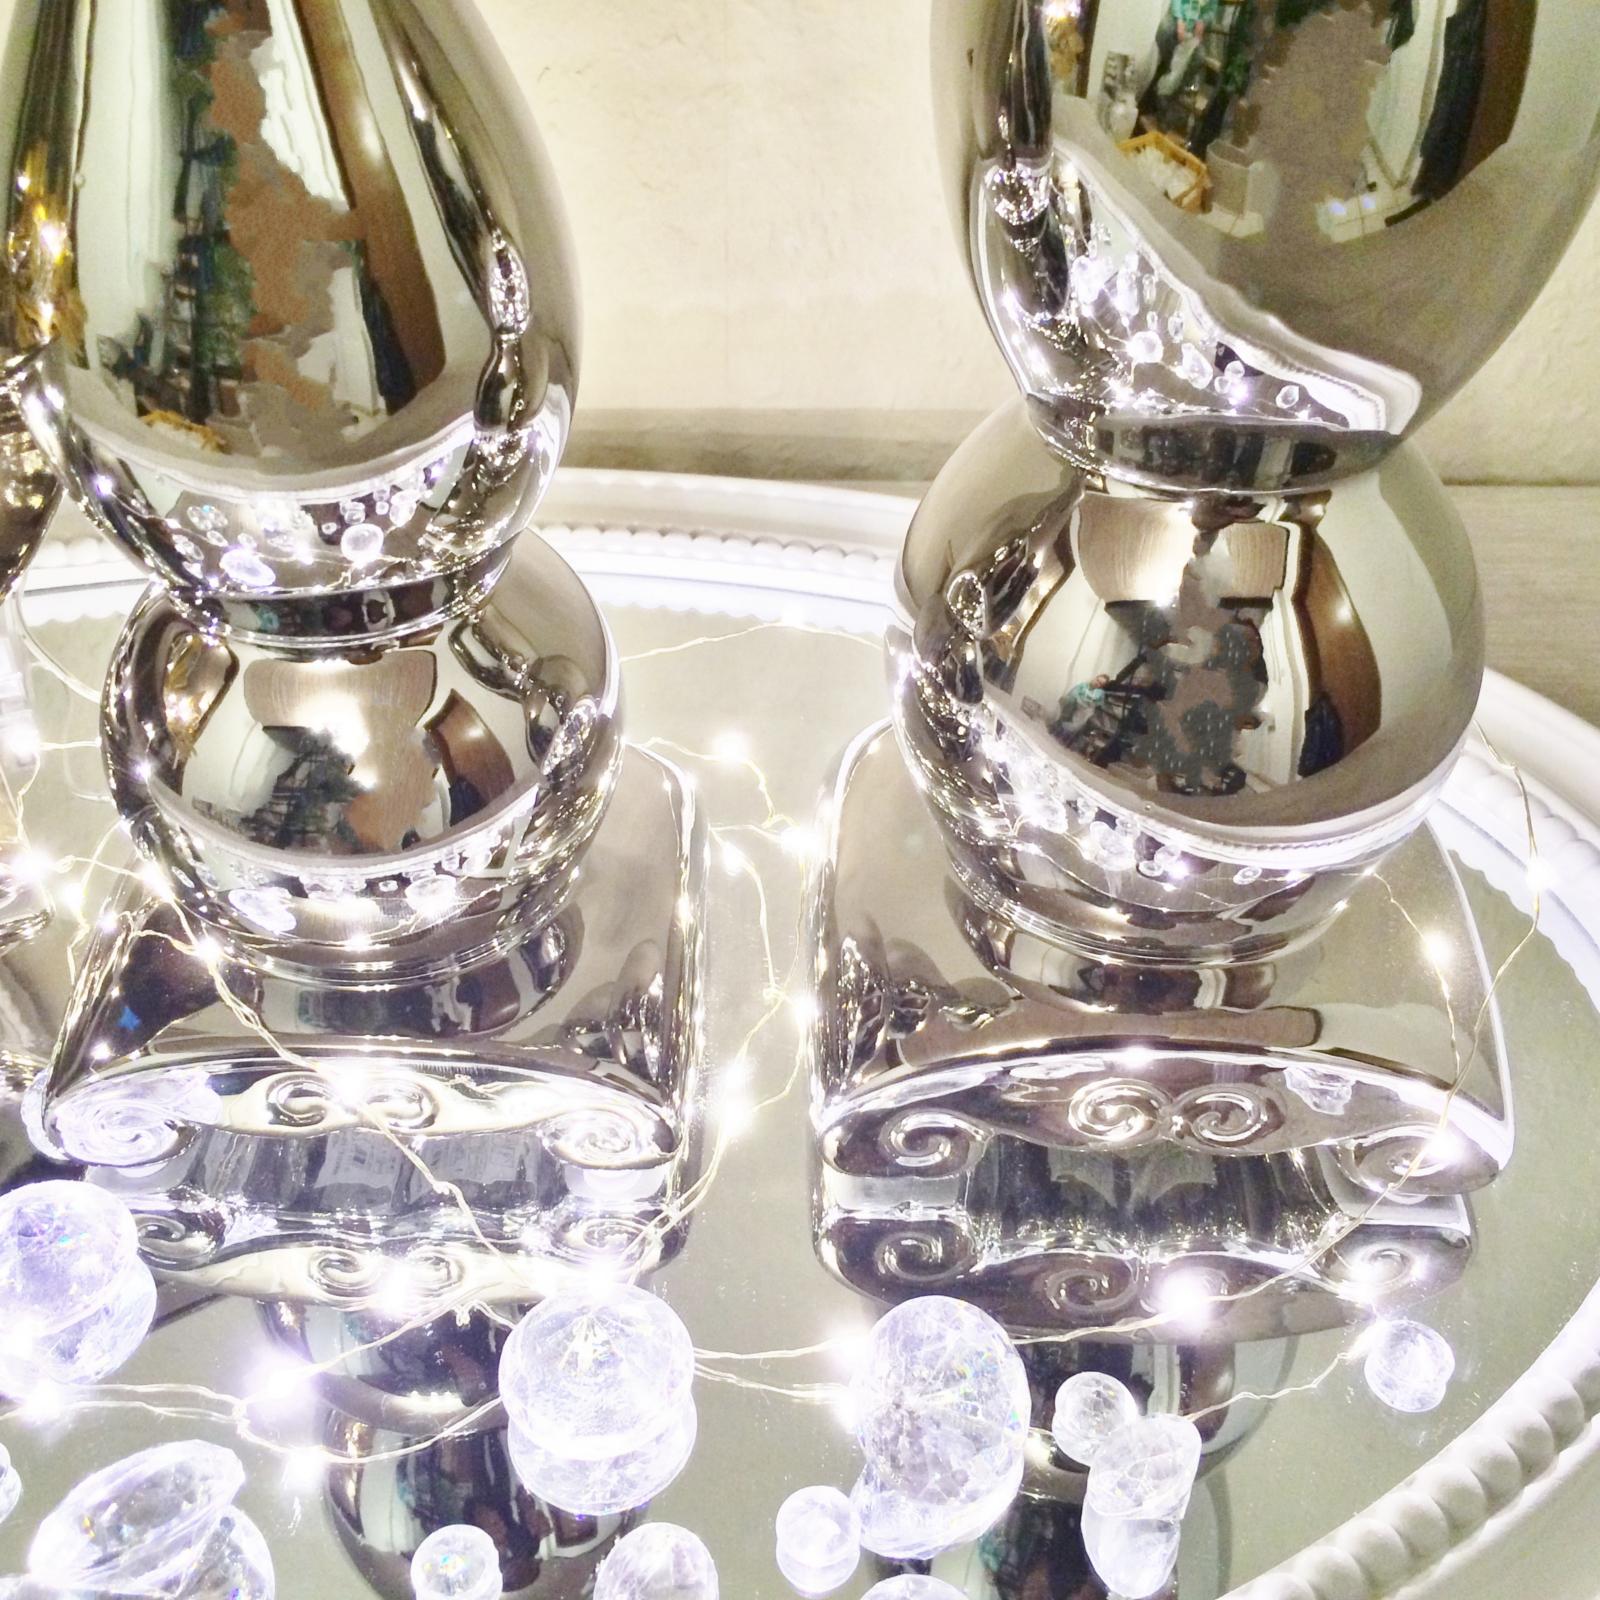 Kerzenleuchter f1 kerzenst nder kerzenhalter deko keramik dekoration silber - Dekoration silber ...